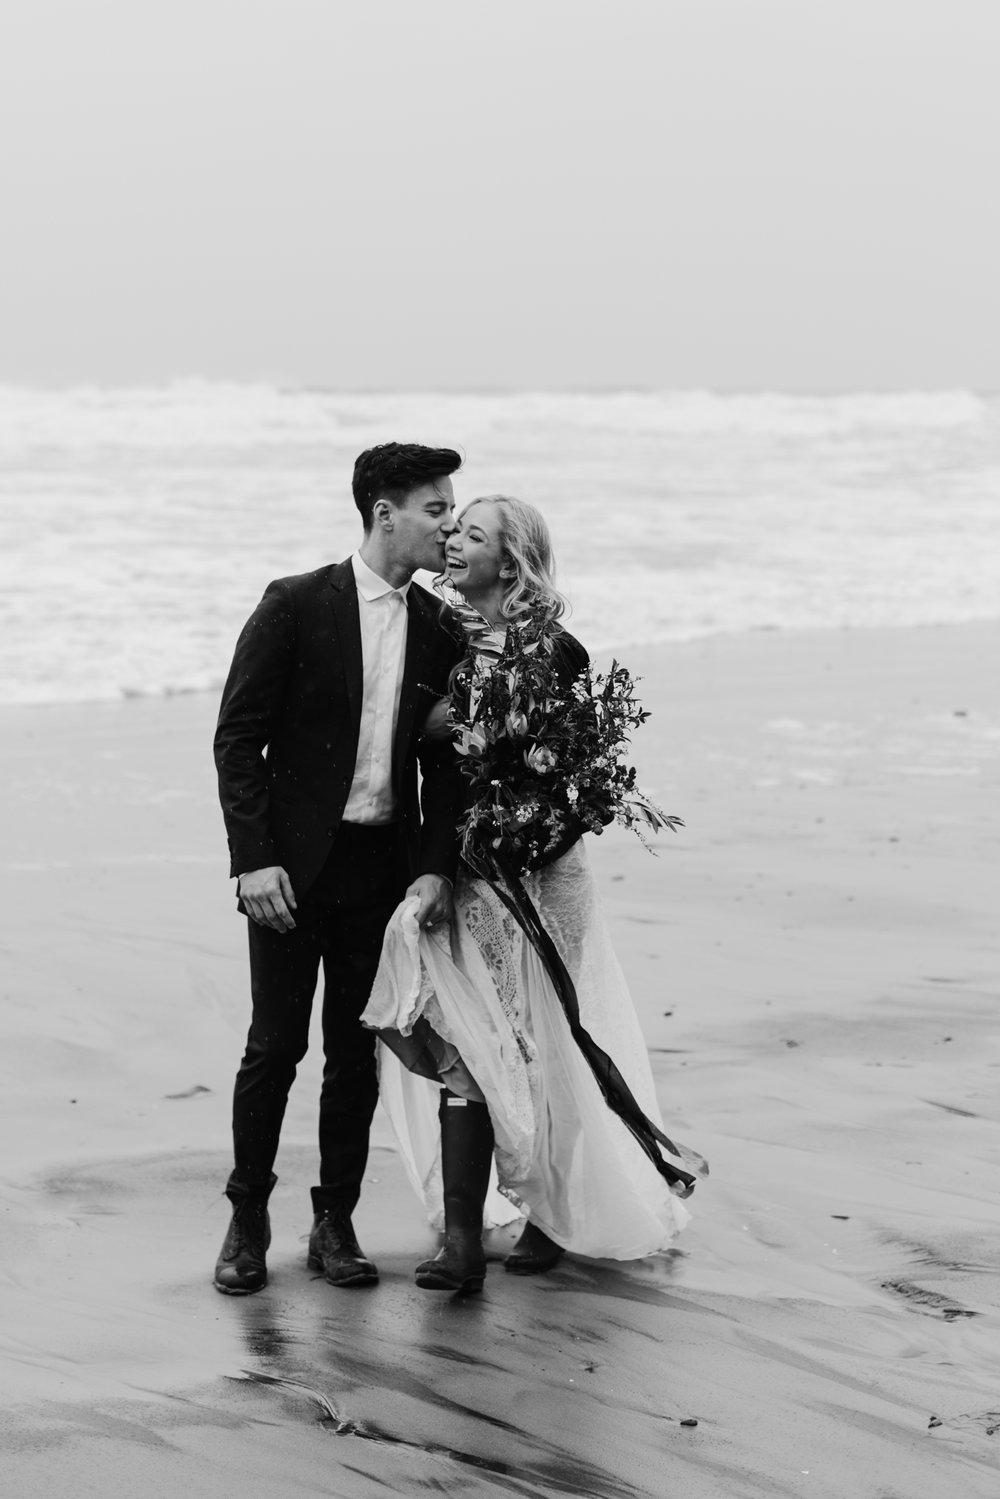 adventurous-oregon-elopement-2018-05-02_0002.jpg